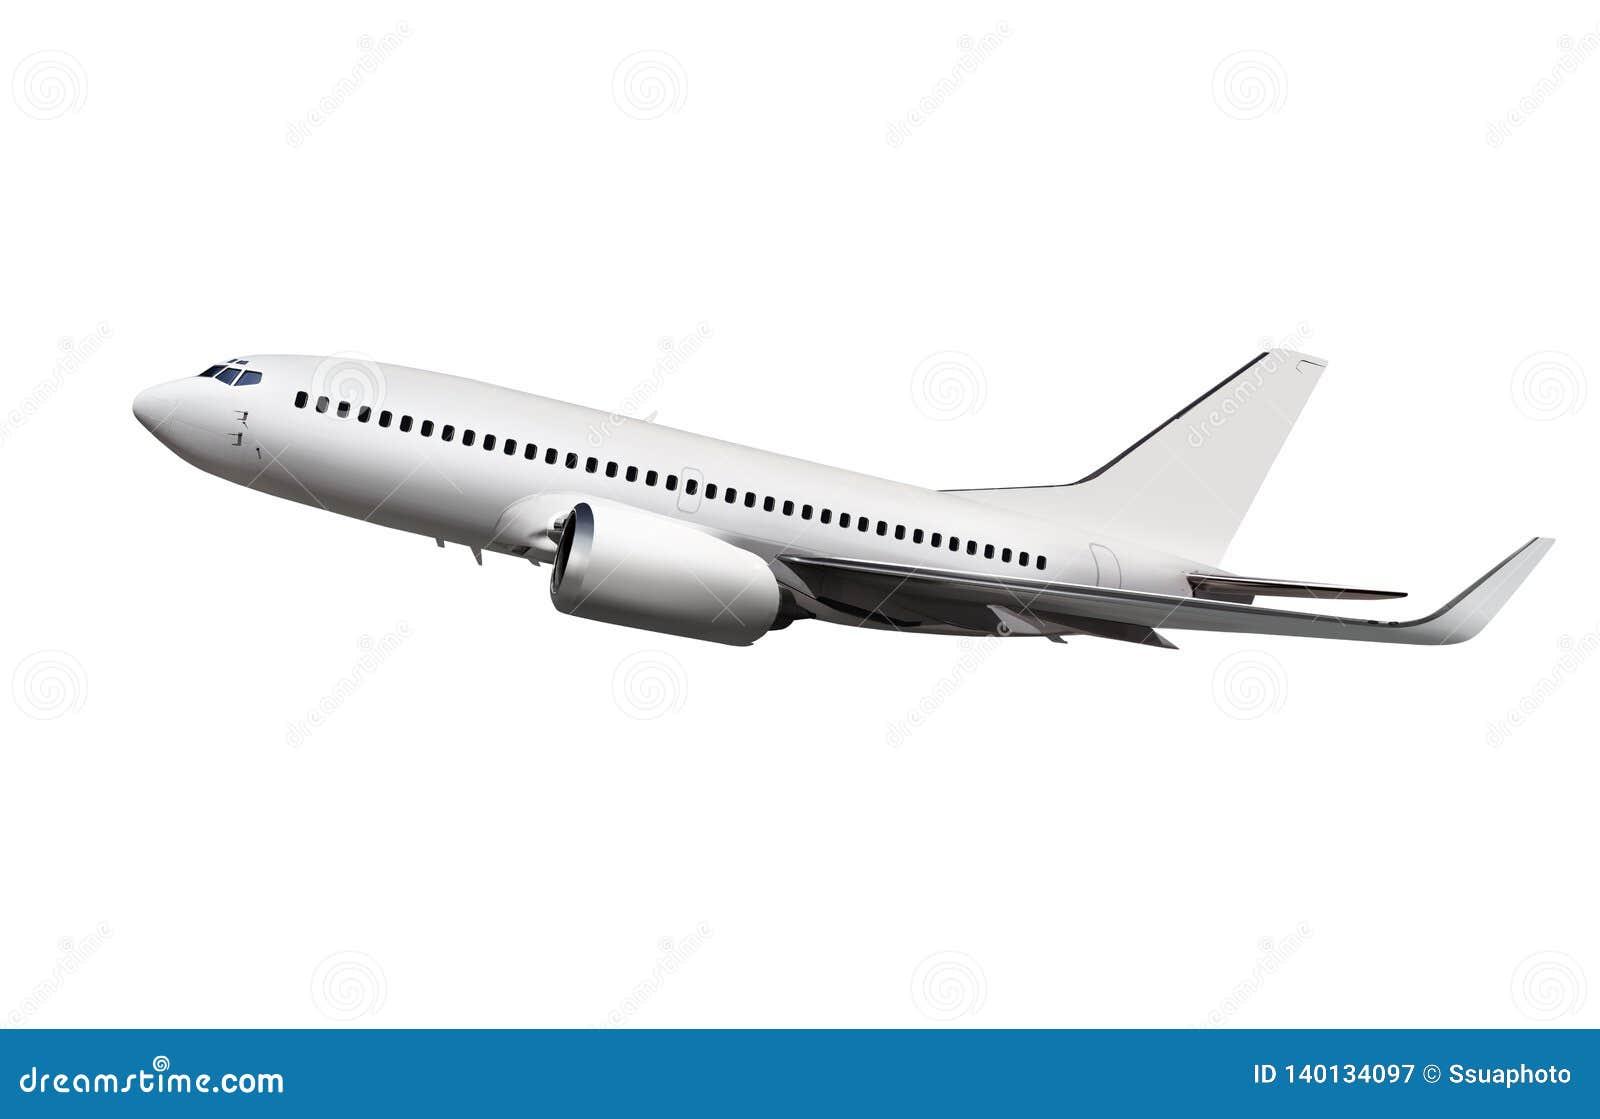 Passenger aircraft isolated on bg